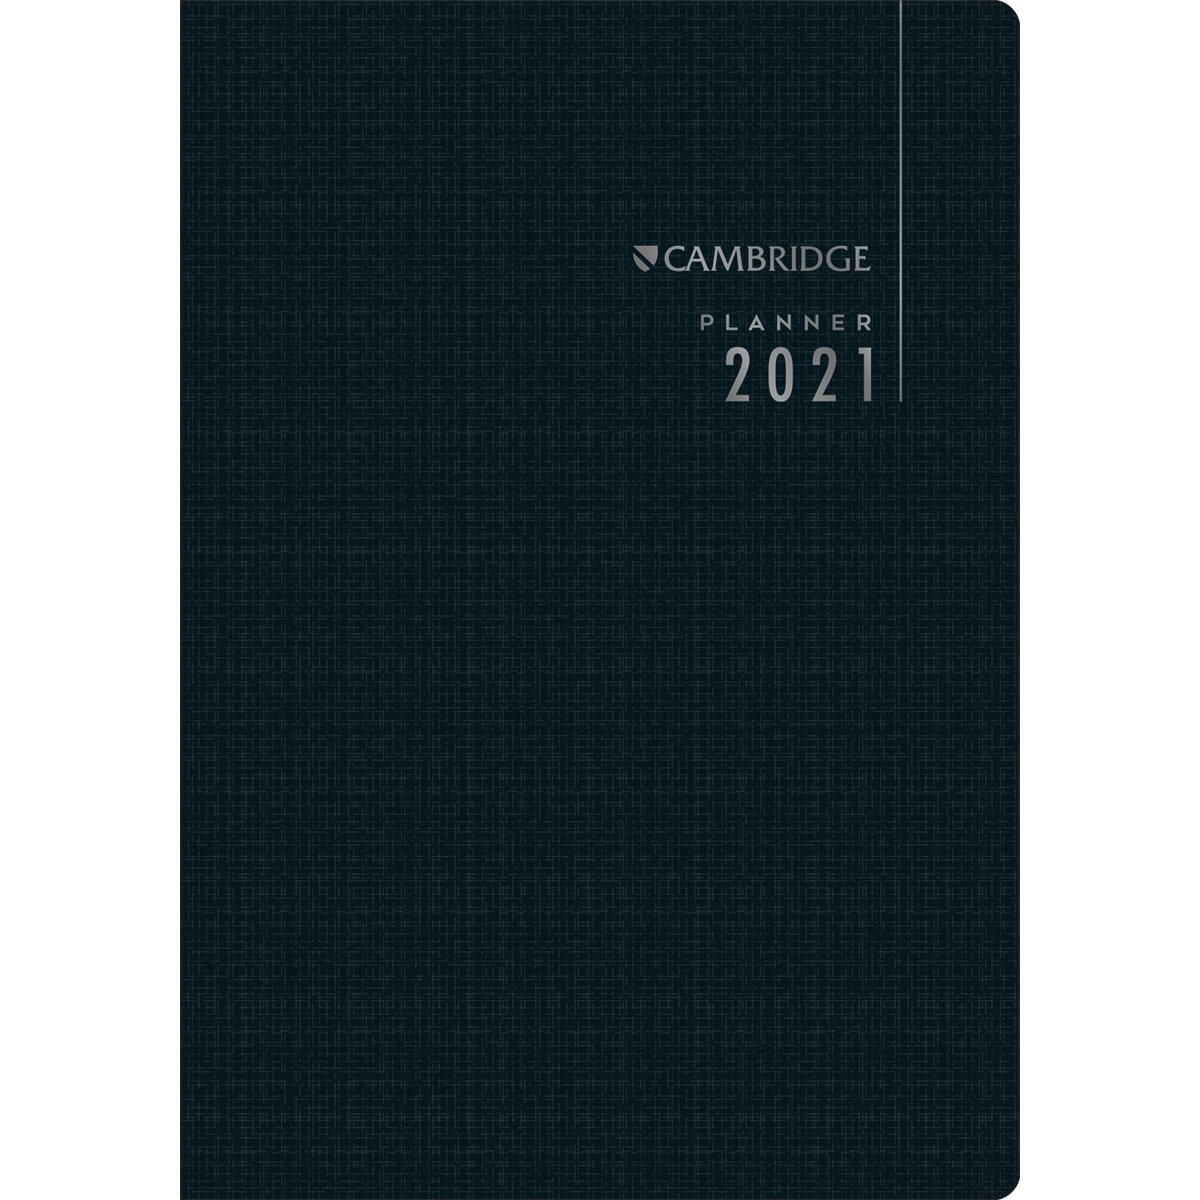 Planner Executivo Grampeado Cambridge 2021